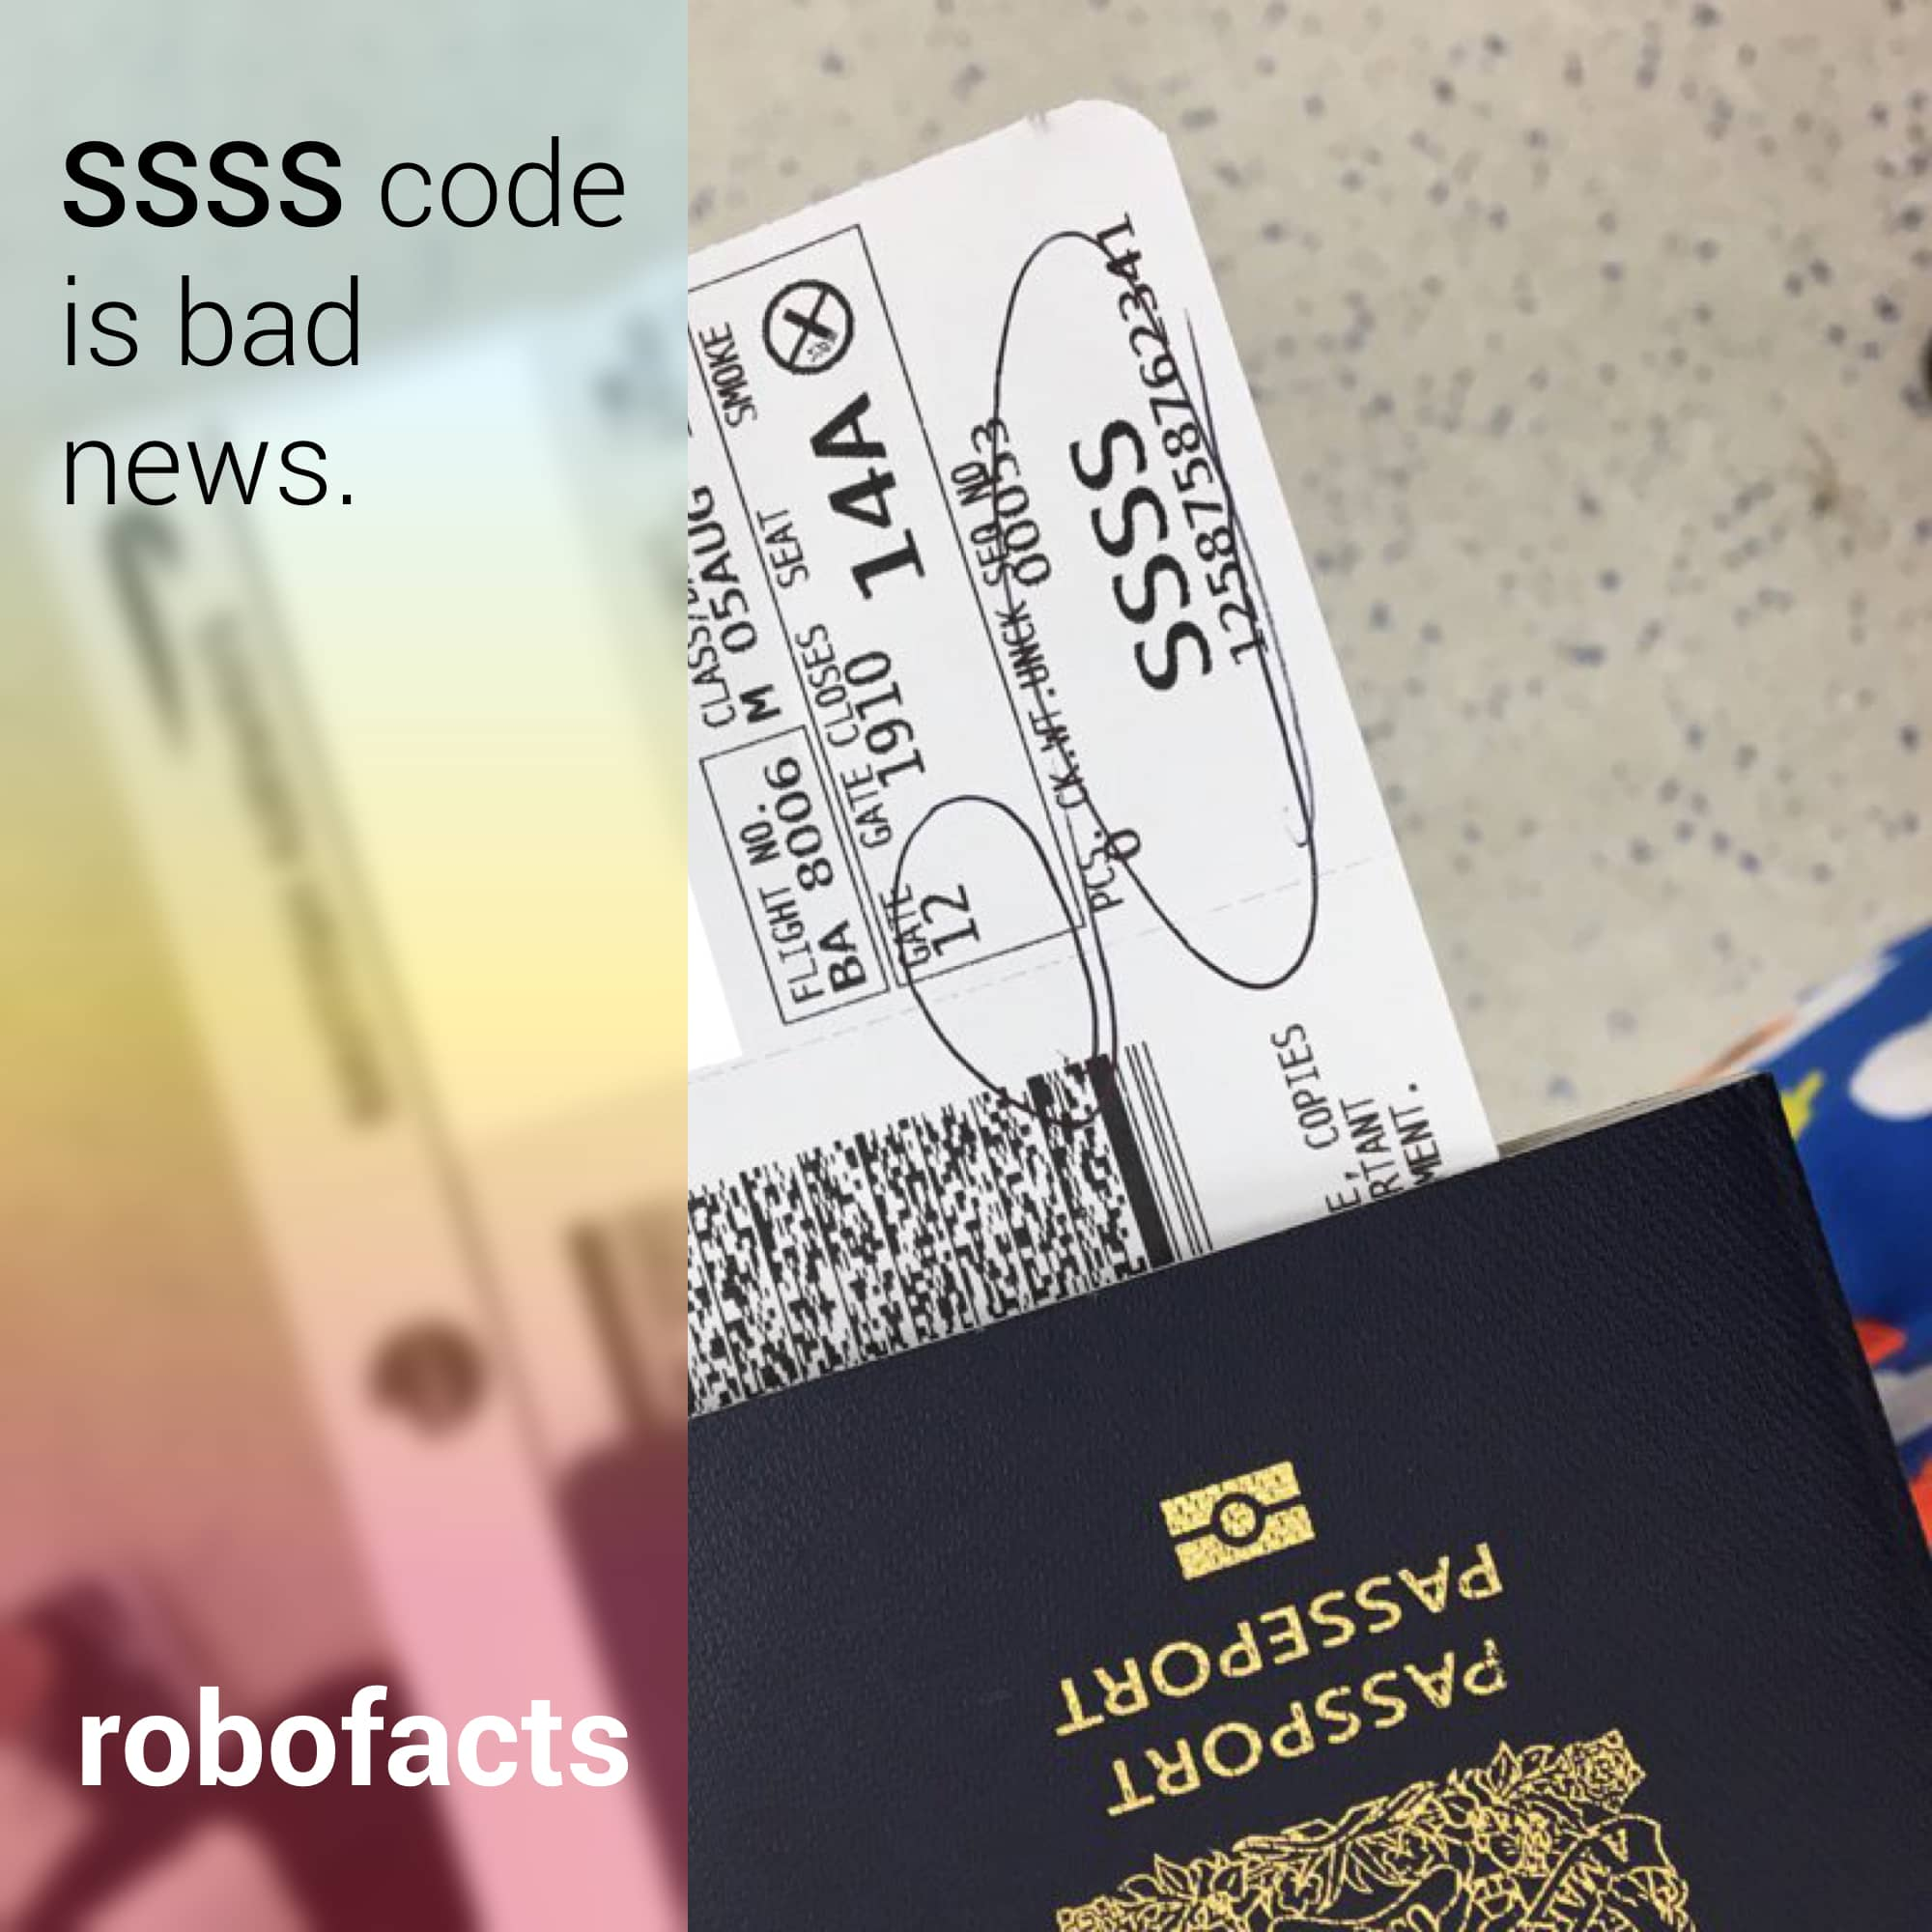 SSSS Kodu